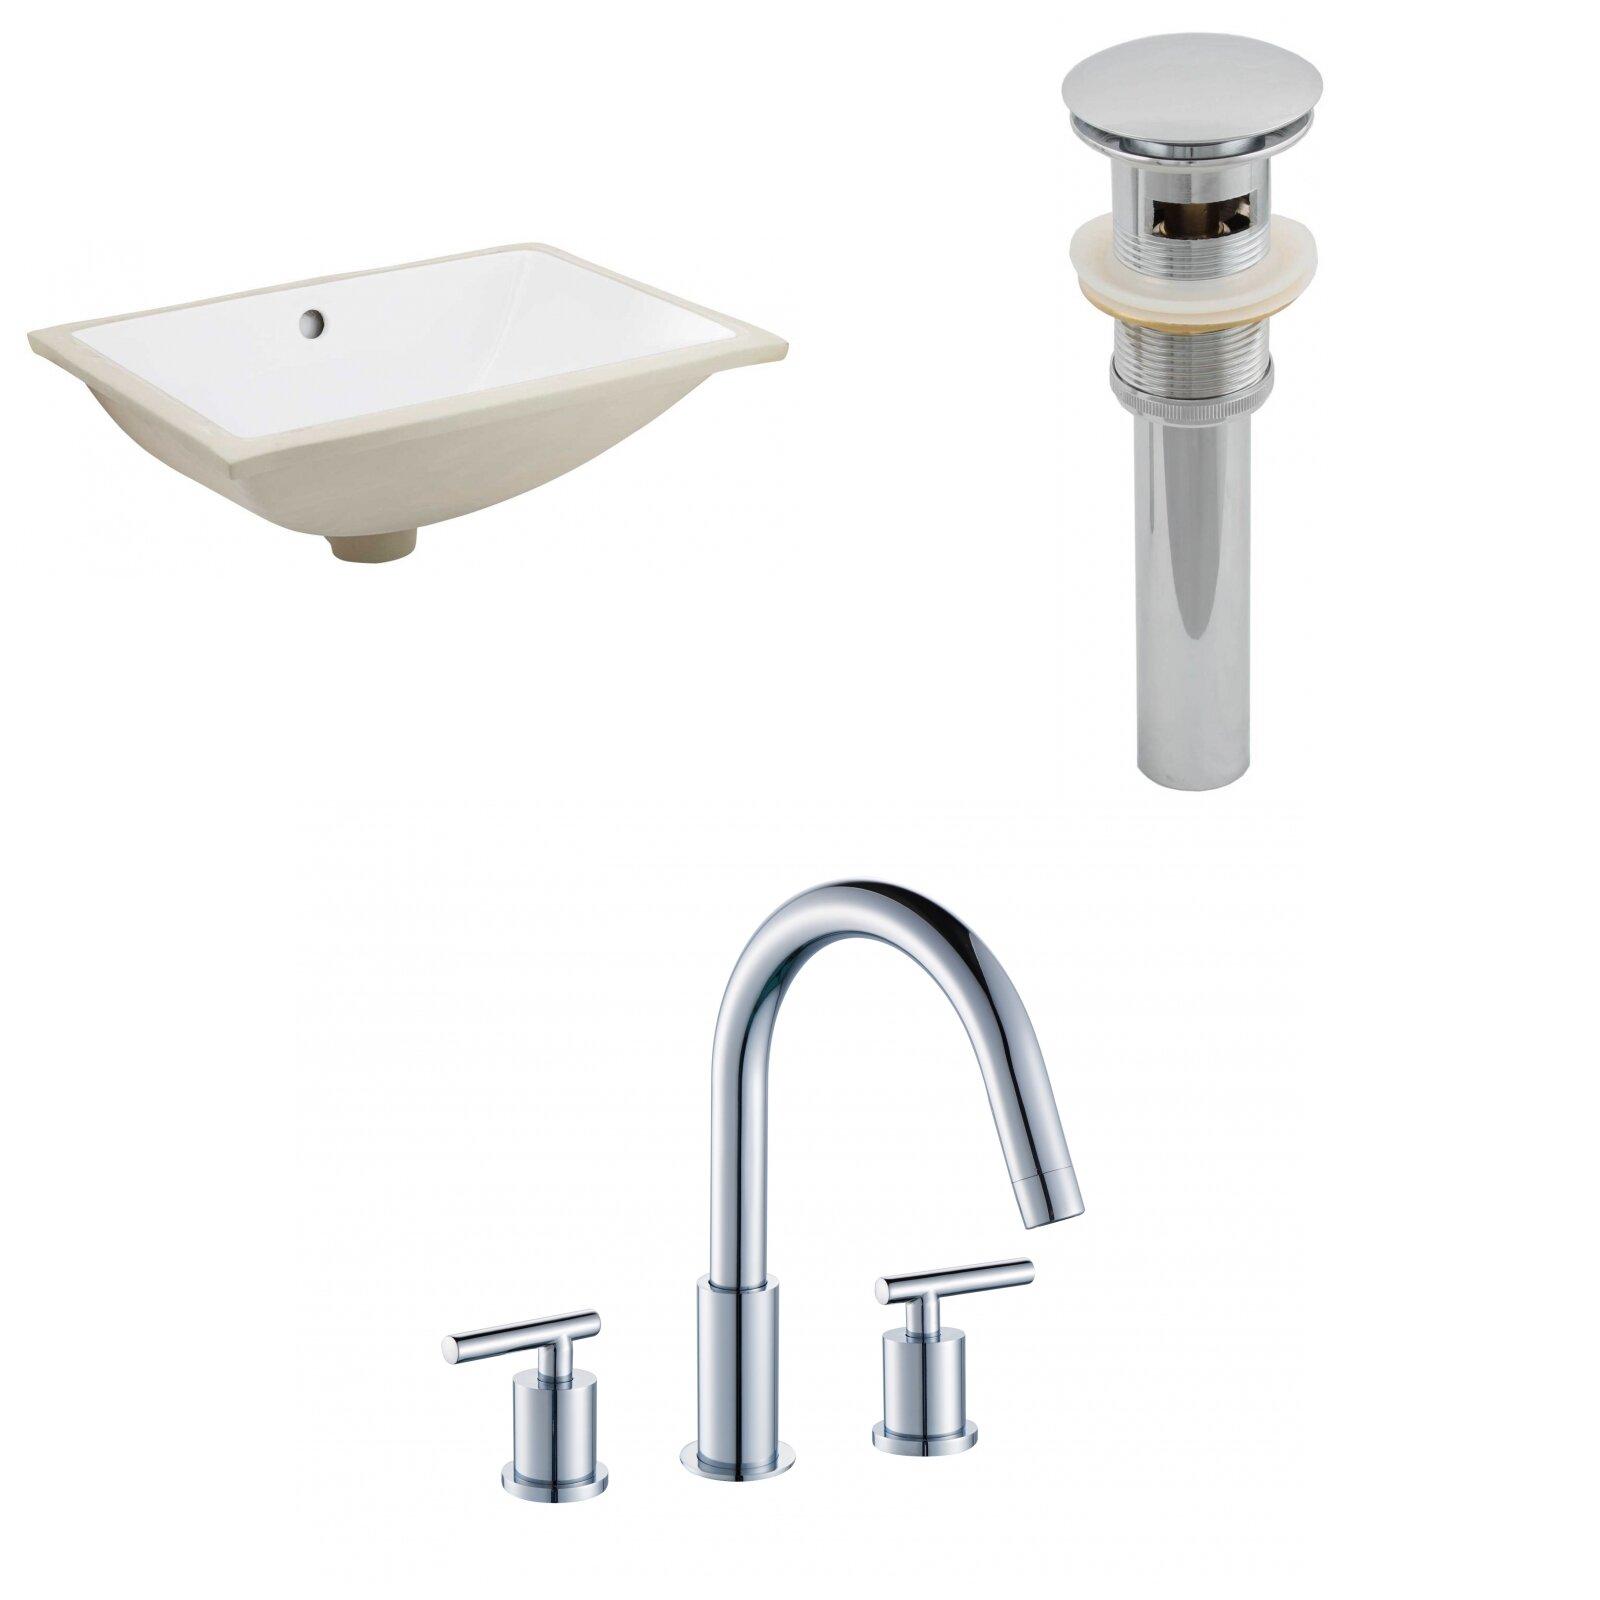 Royalpurplebathkitchen Cupc Ceramic Rectangular Undermount Bathroom Sink With Faucet And Overflow Wayfair